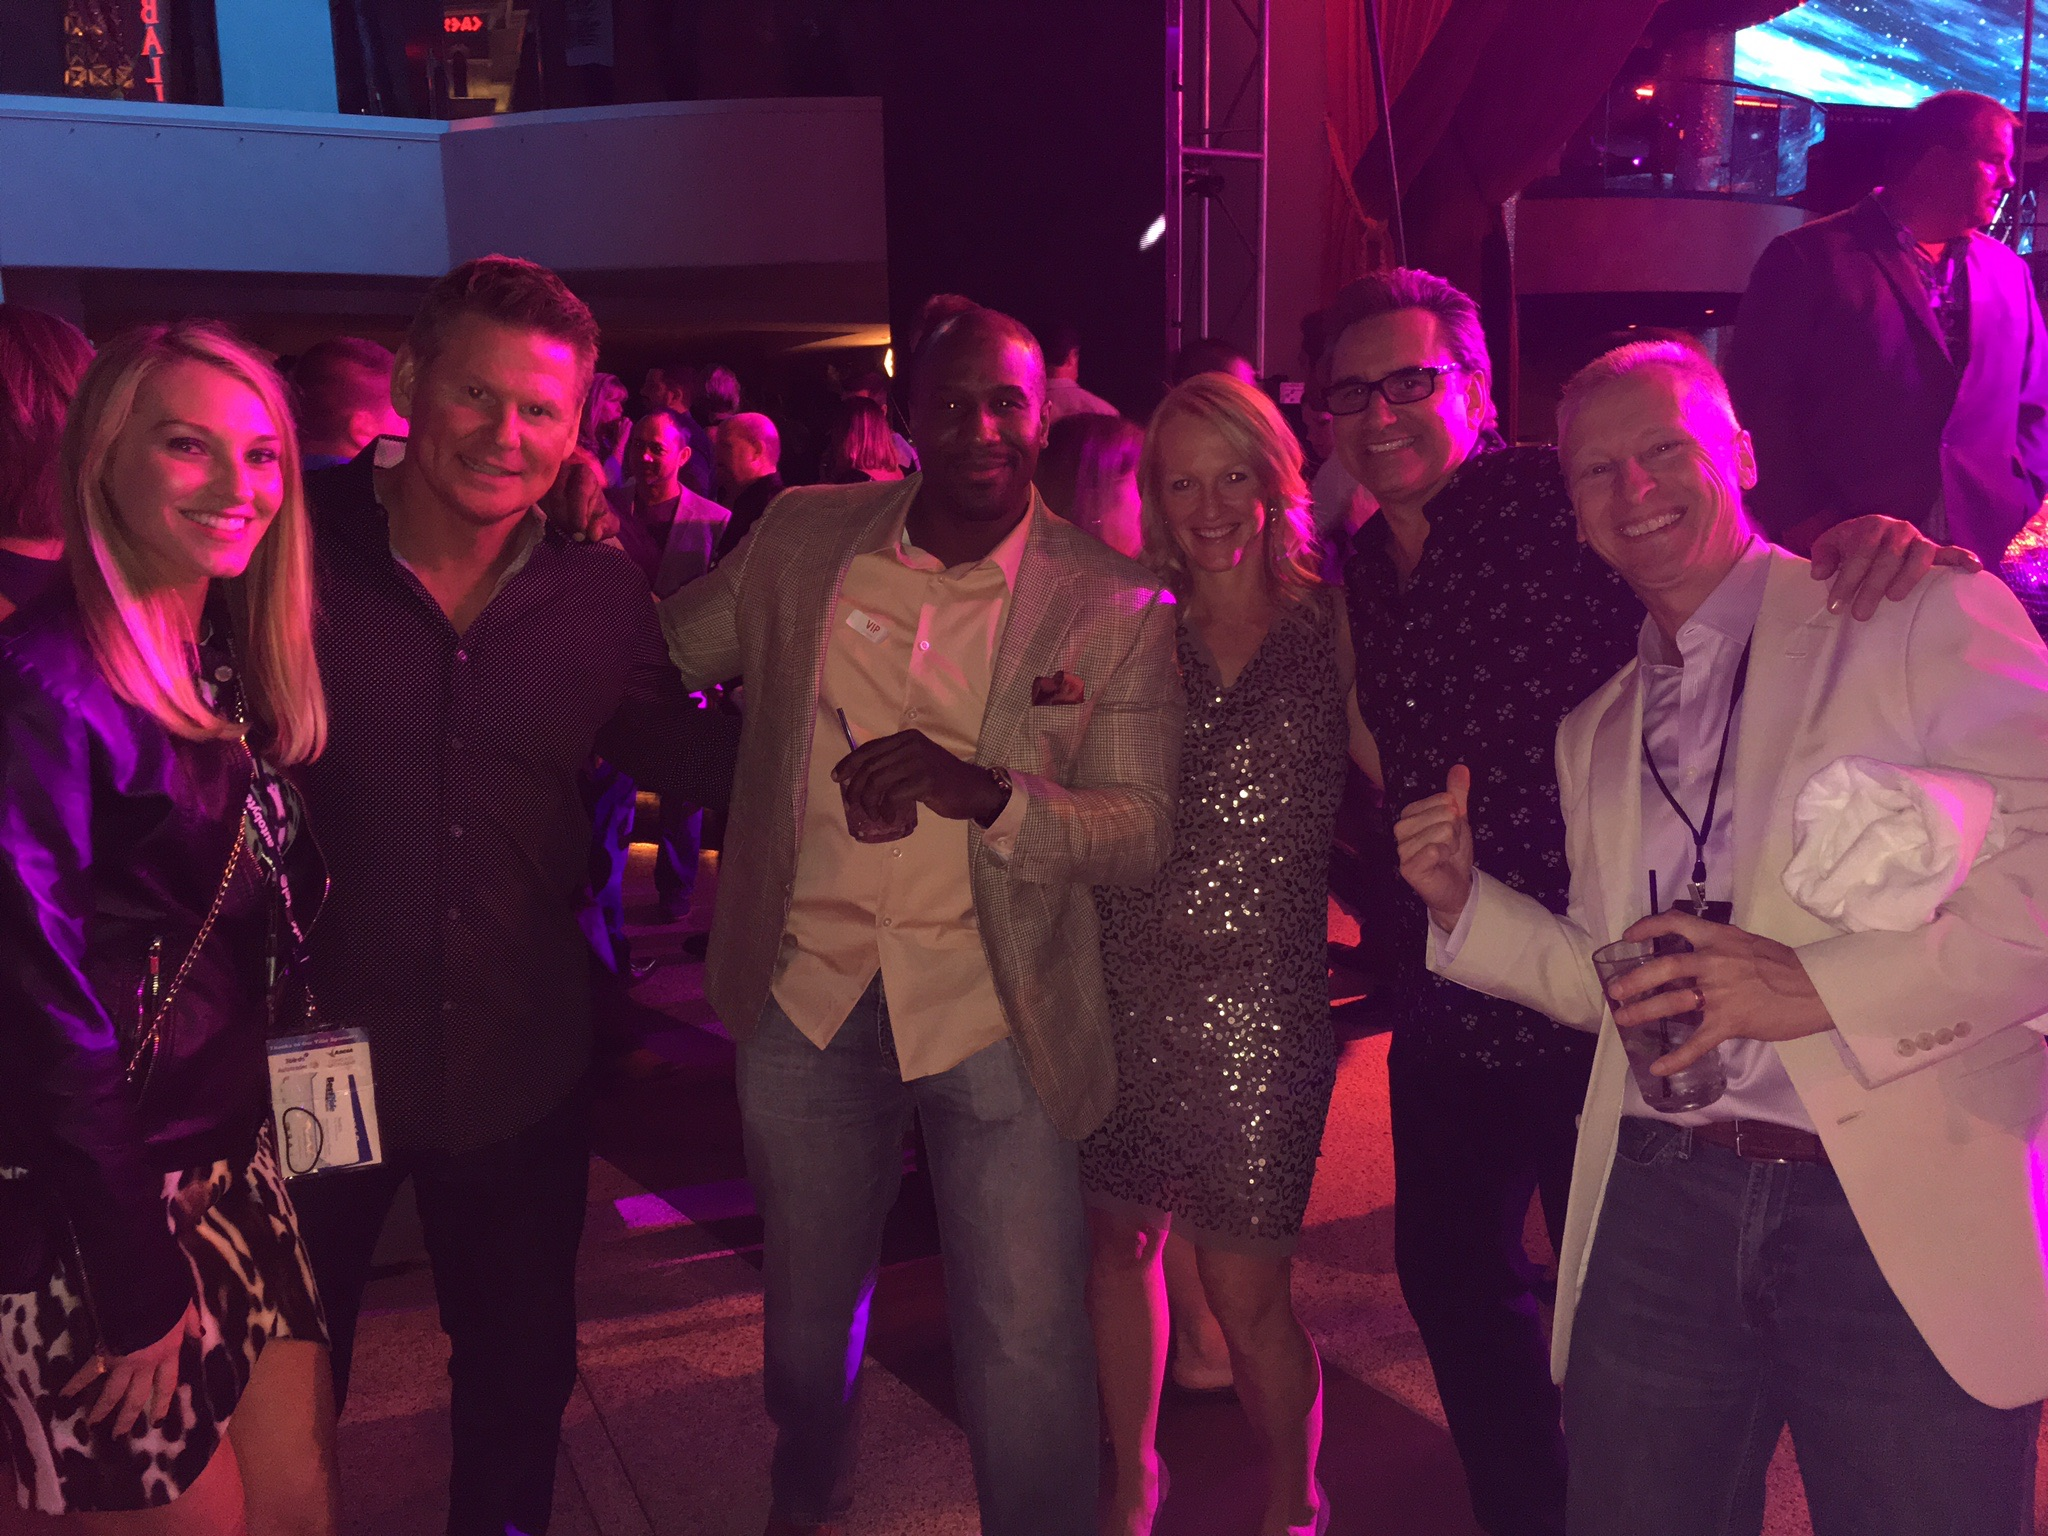 Tim Triplett, Alex Jefferson, Julie Frye, and Mike Roscoe at Drai's Nightclub